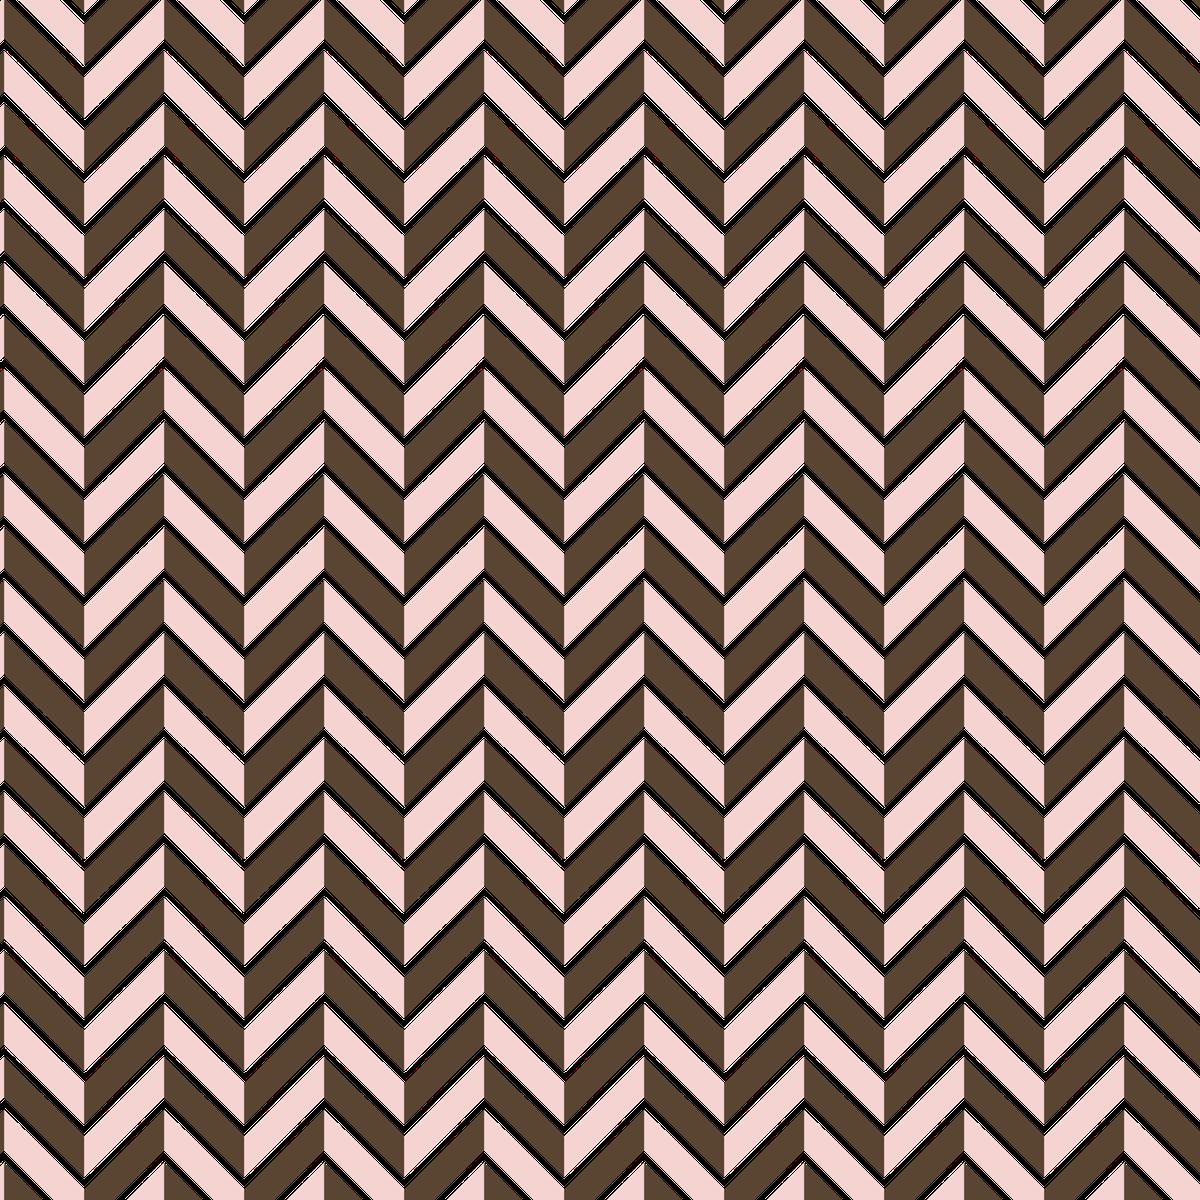 Pink-Brown Herringbone & Mini Dots